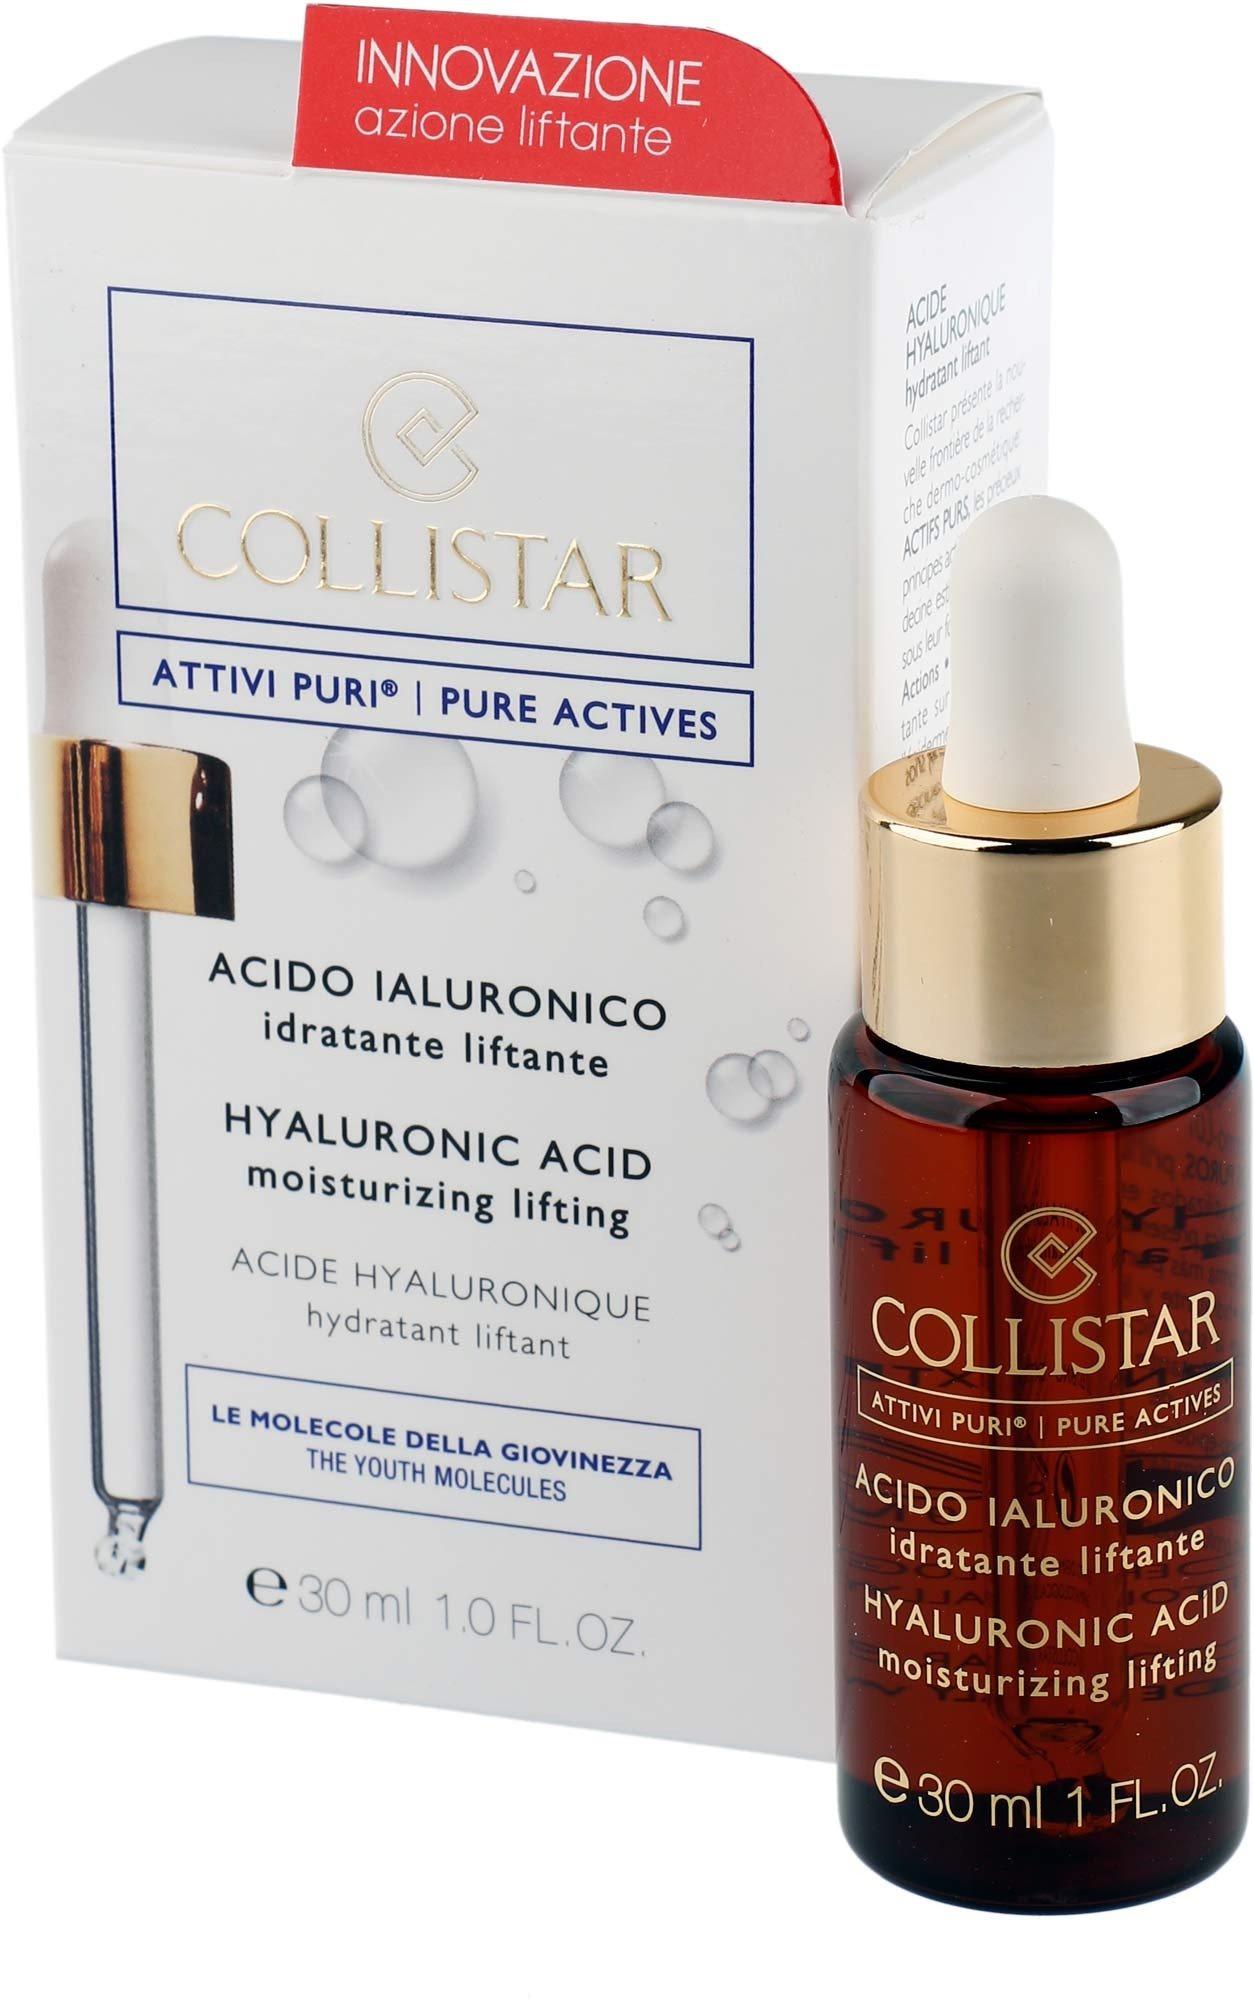 COLLISTAR Hyaluronic Acid Moisturizing Lifting 30 ml